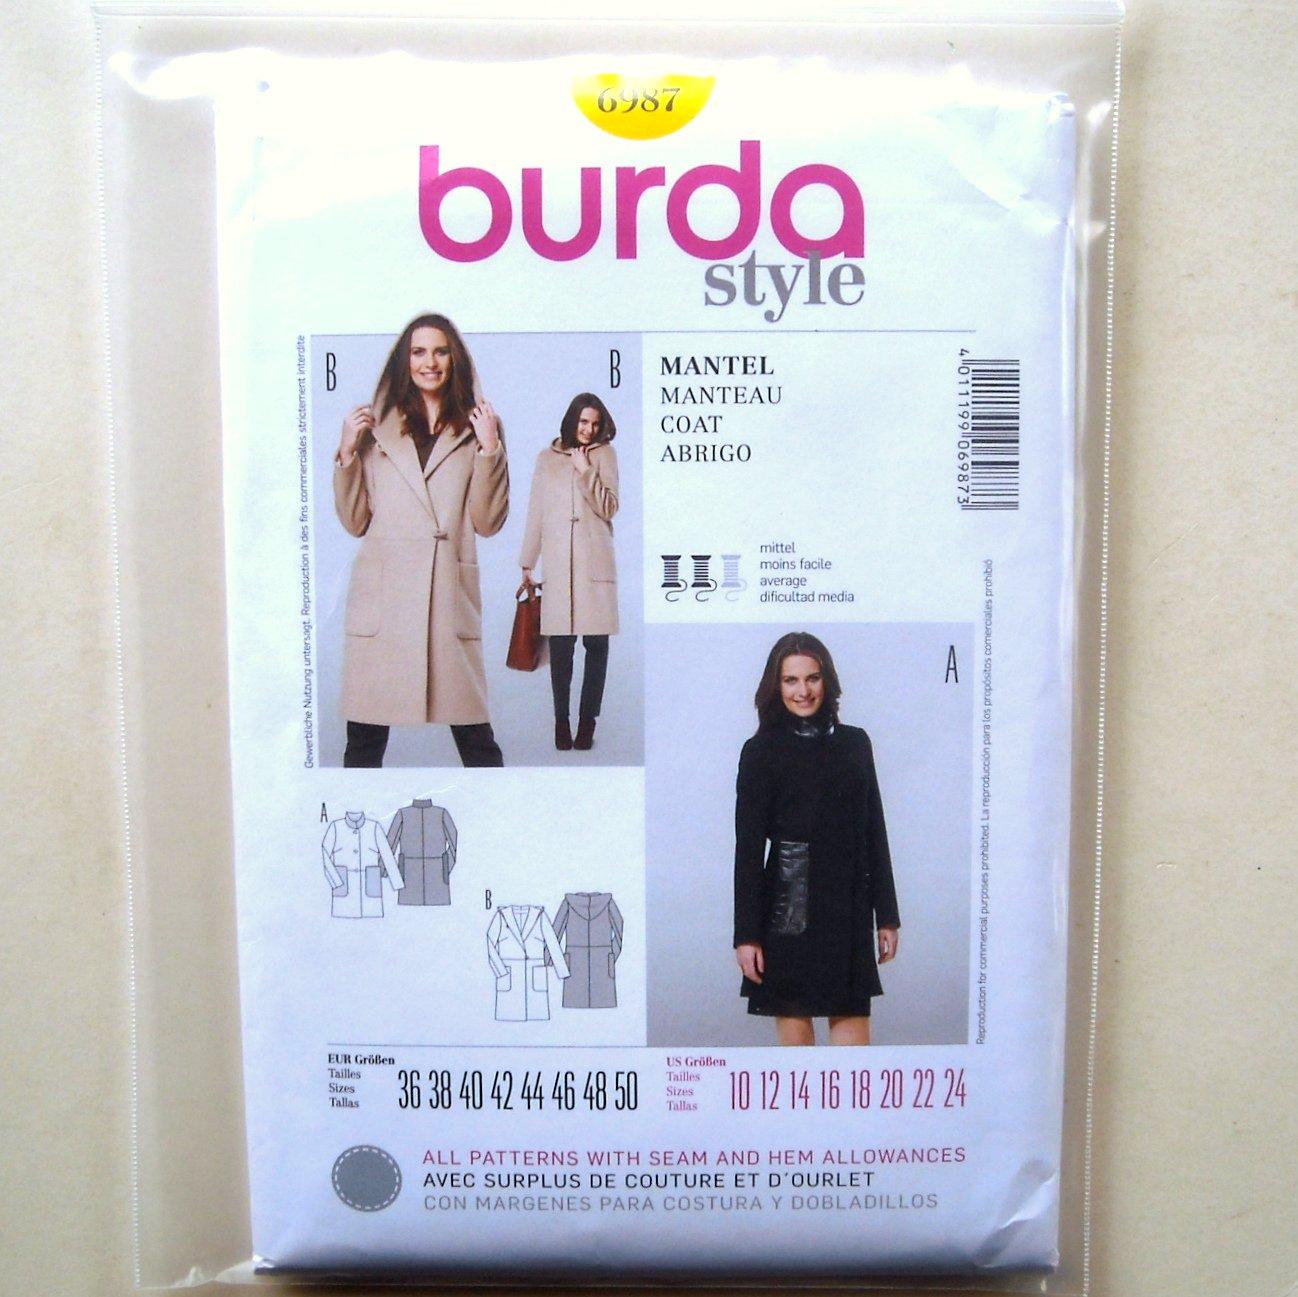 Misses Coat 10 12 14 16 18 20 22 24 Burda Style Sewing Pattern 6987